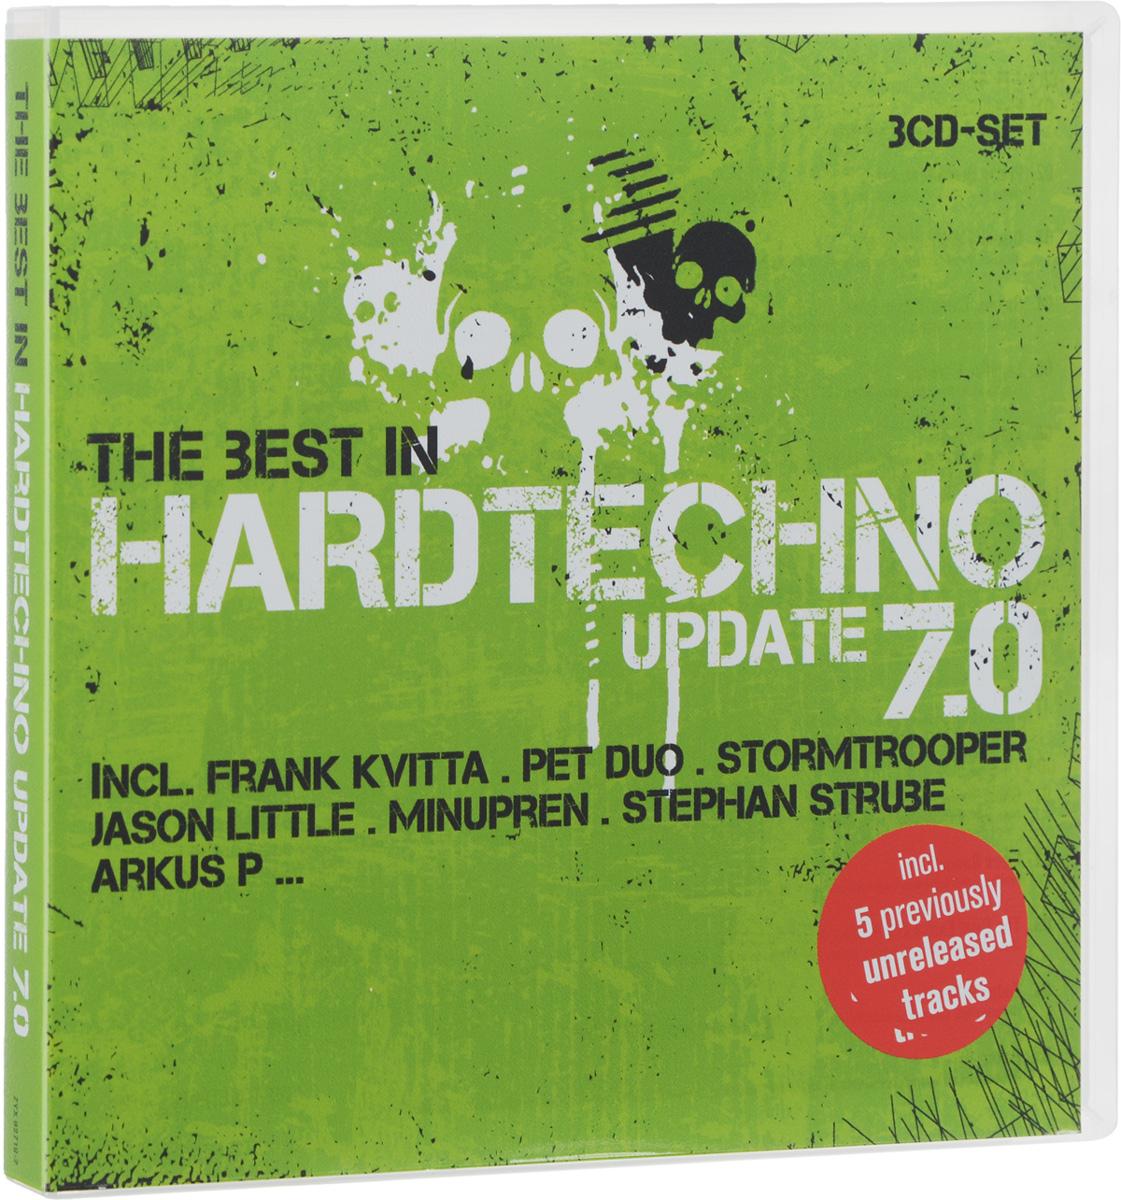 The Best In Hardtechno. Update 7.0 (3 CD) the best in hardtechno update 7 0 3 cd